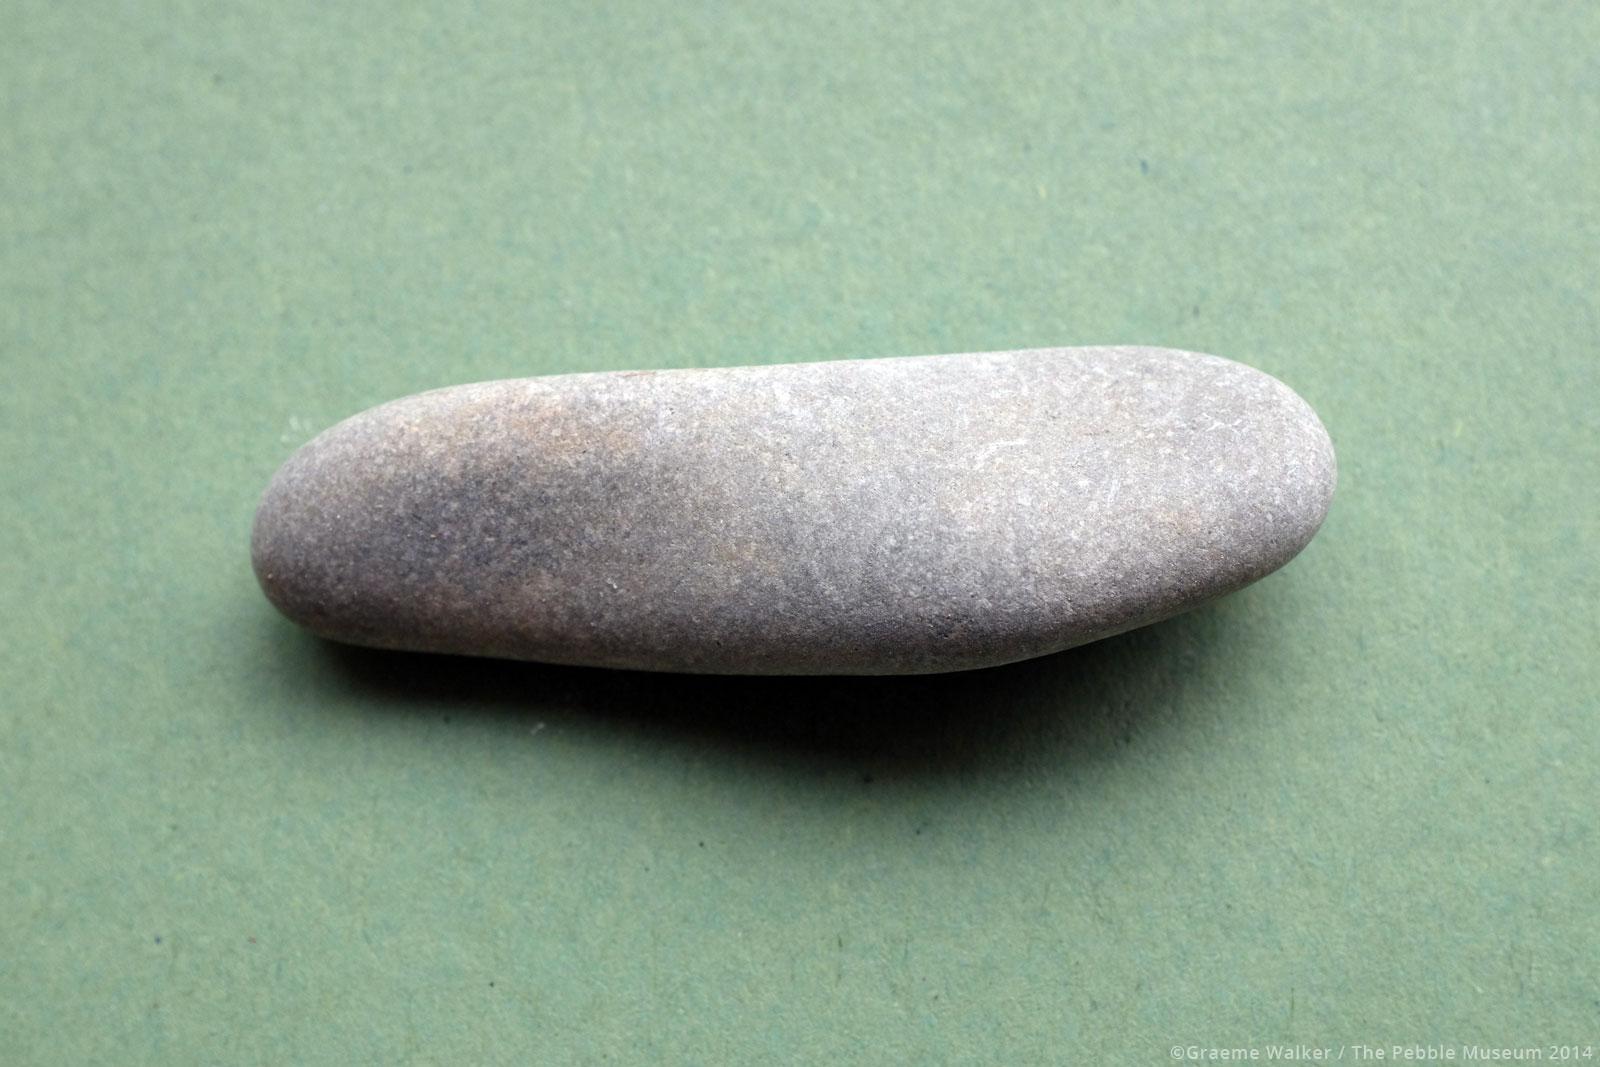 Smooth Grey Pebble © Graeme Walker / The Pebble Museum 2019